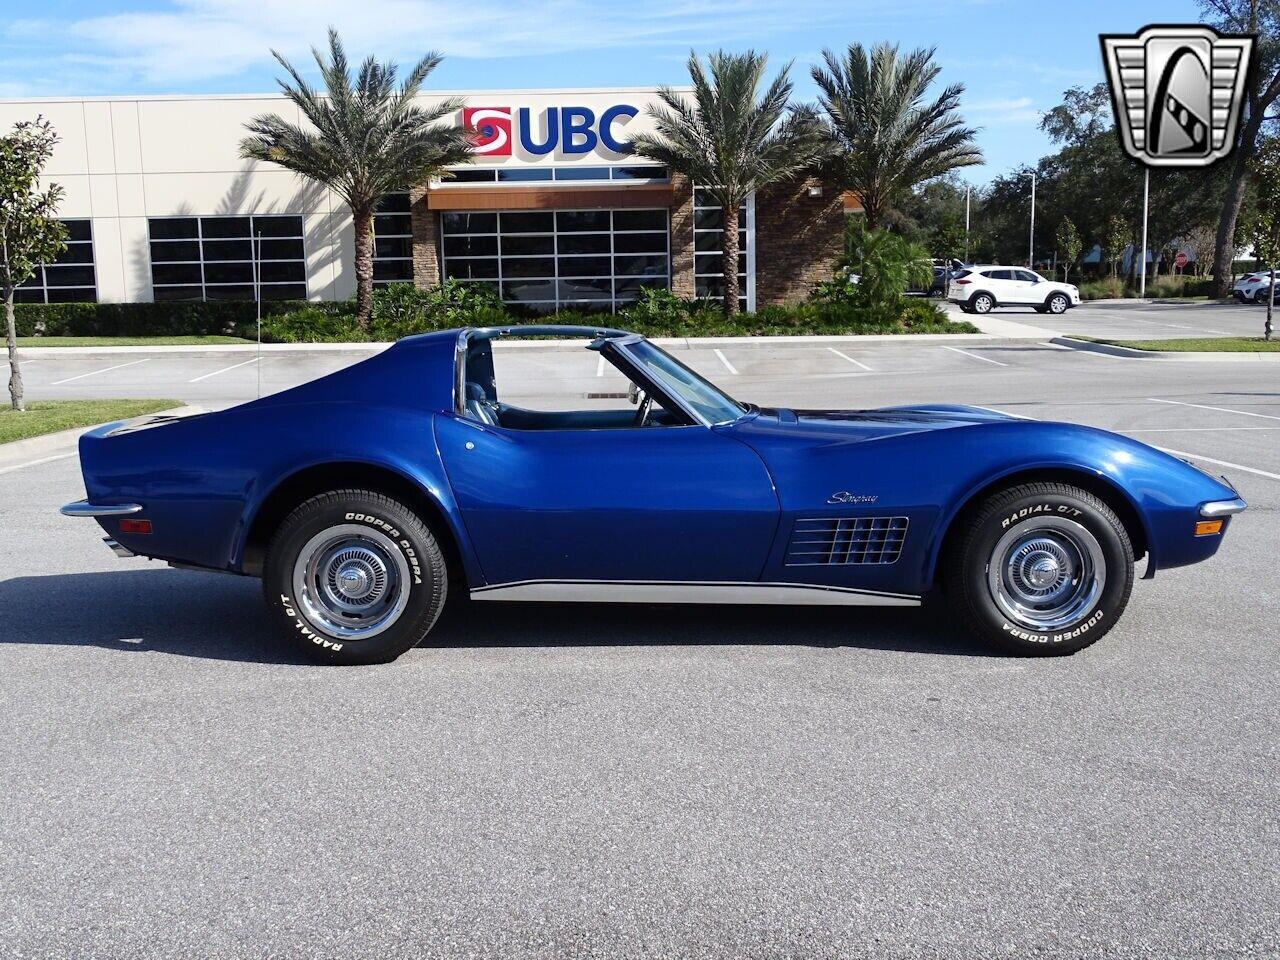 1972 Blue Chevrolet Corvette Stingray  | C3 Corvette Photo 10